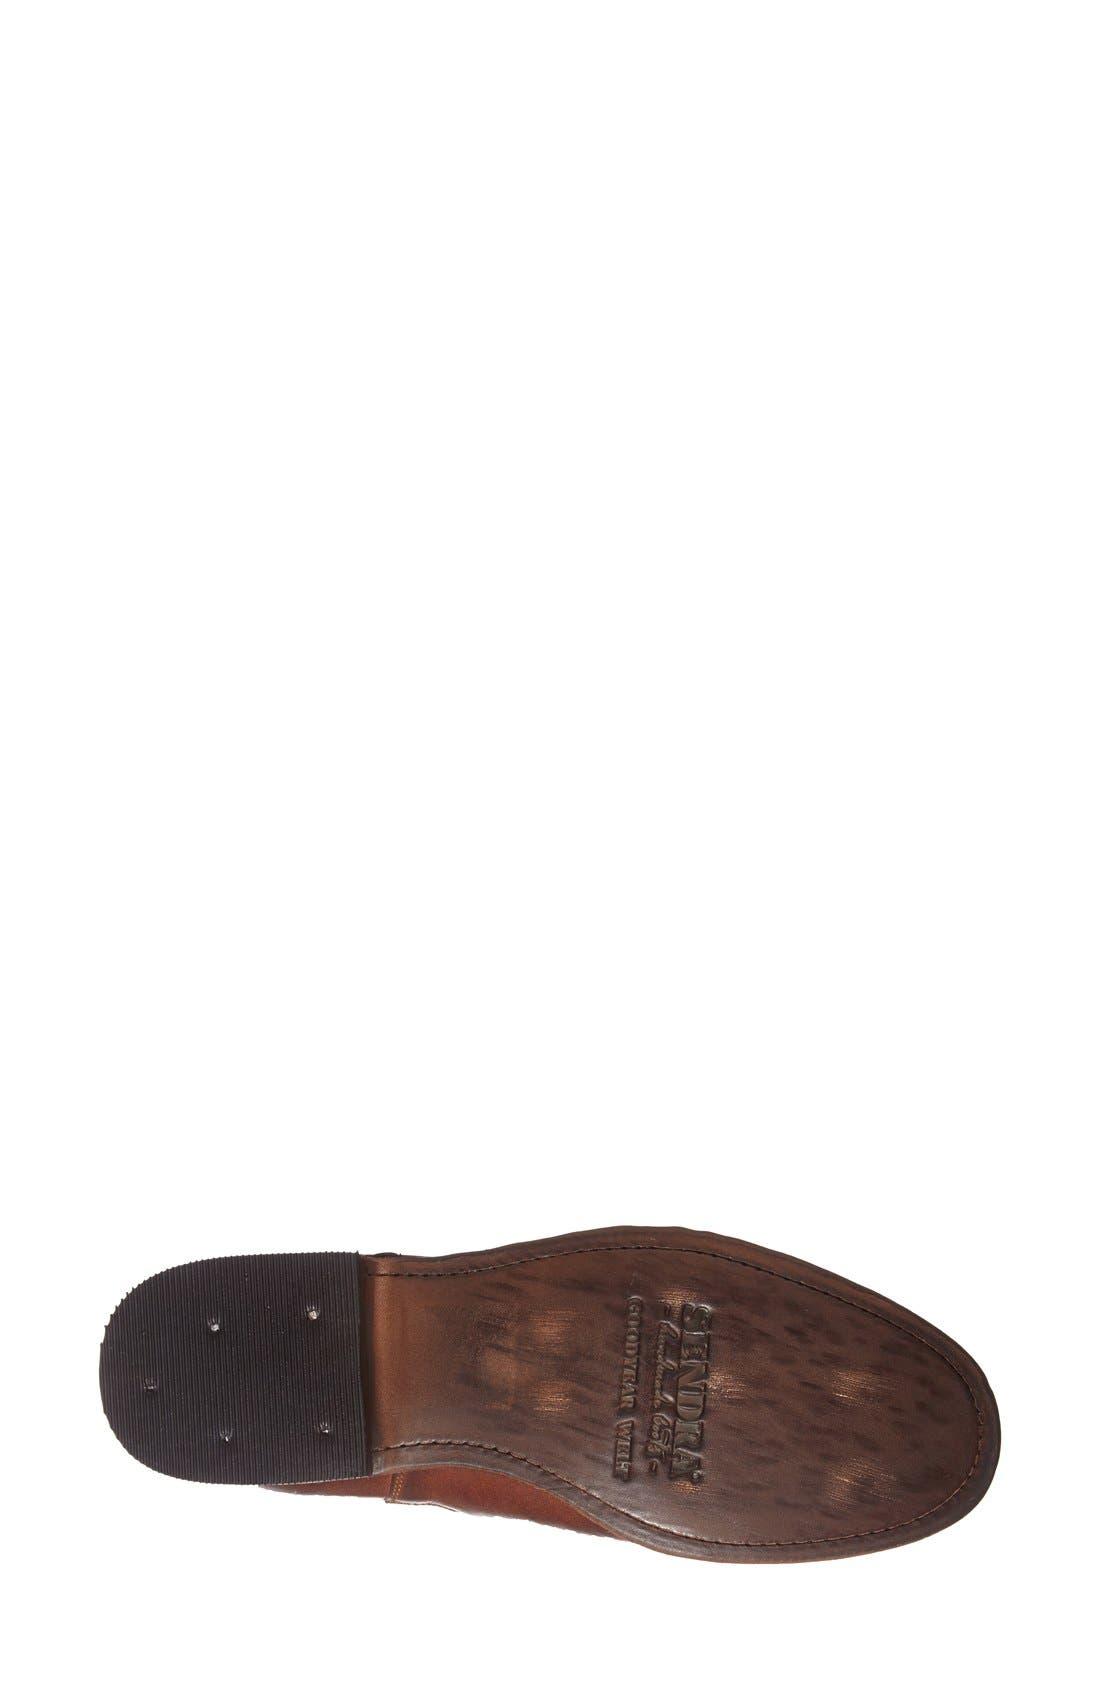 Alternate Image 4  - Sendra 'Barret' Chelsea Boot (Women)